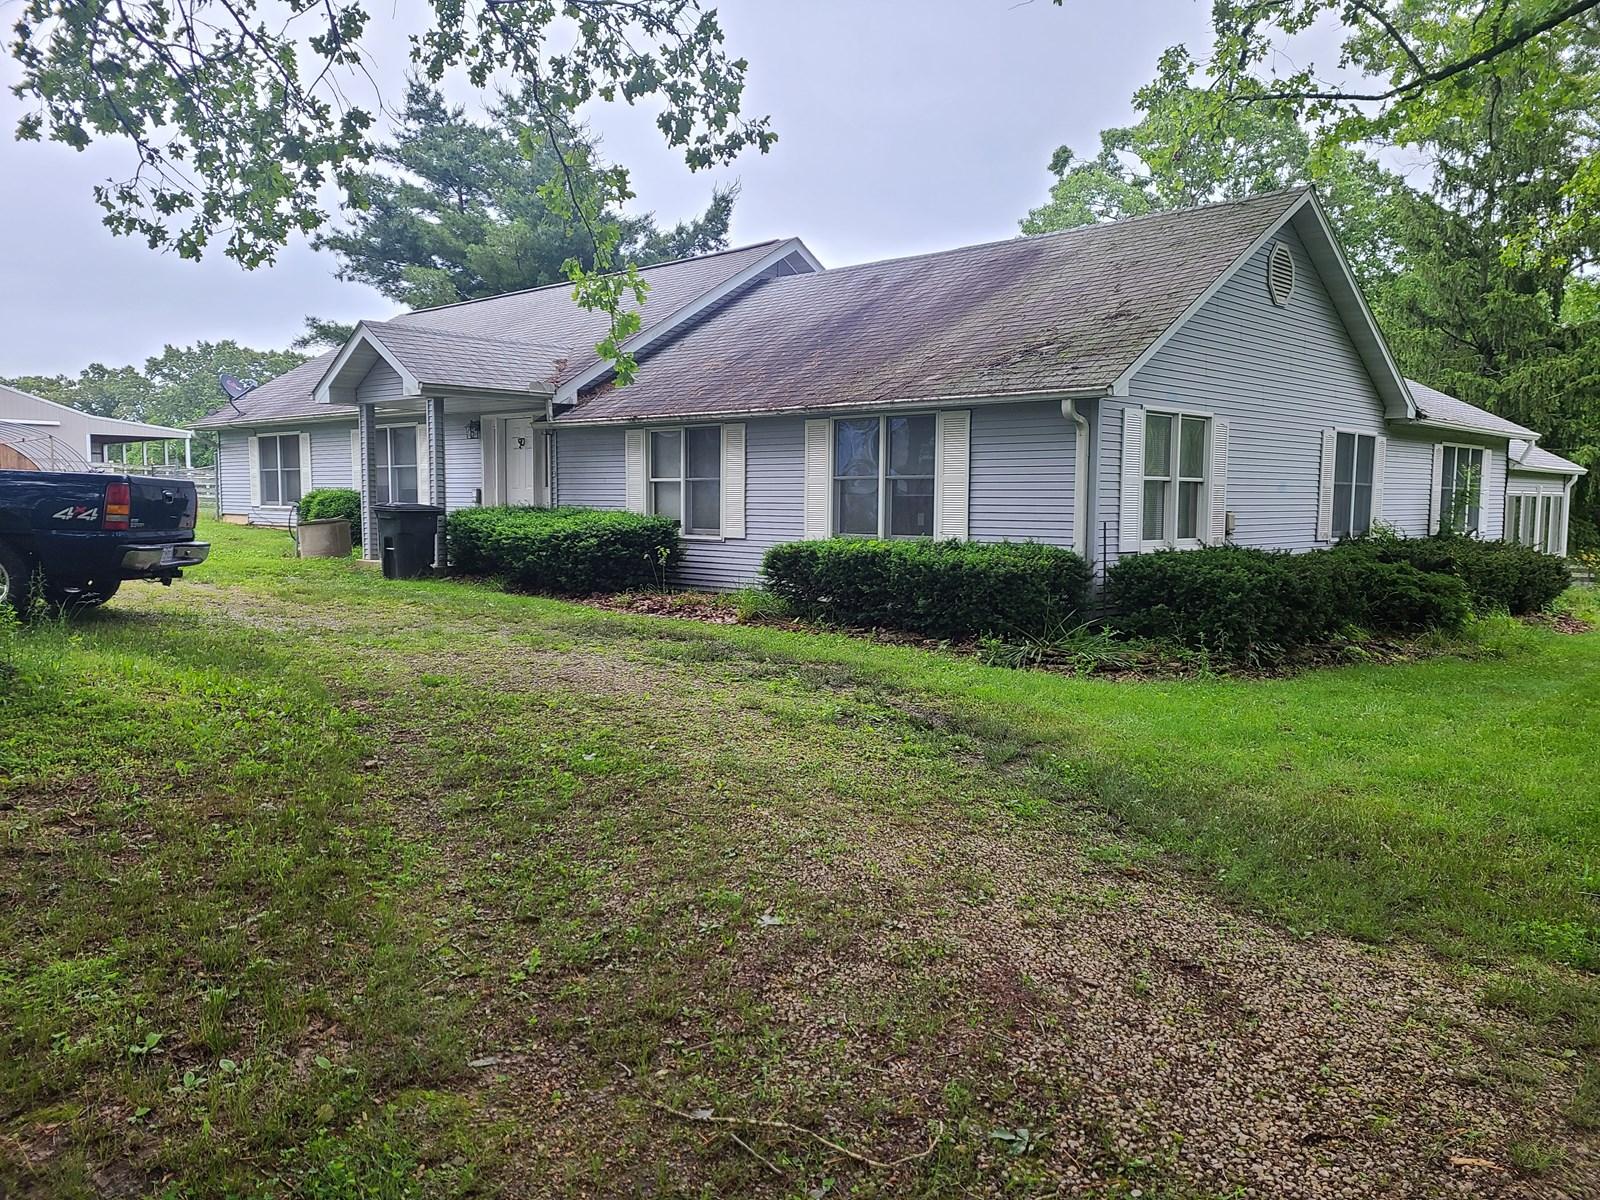 Farm for Sale in Ozark County, 39 acres, 3 Bedroom, Workshop